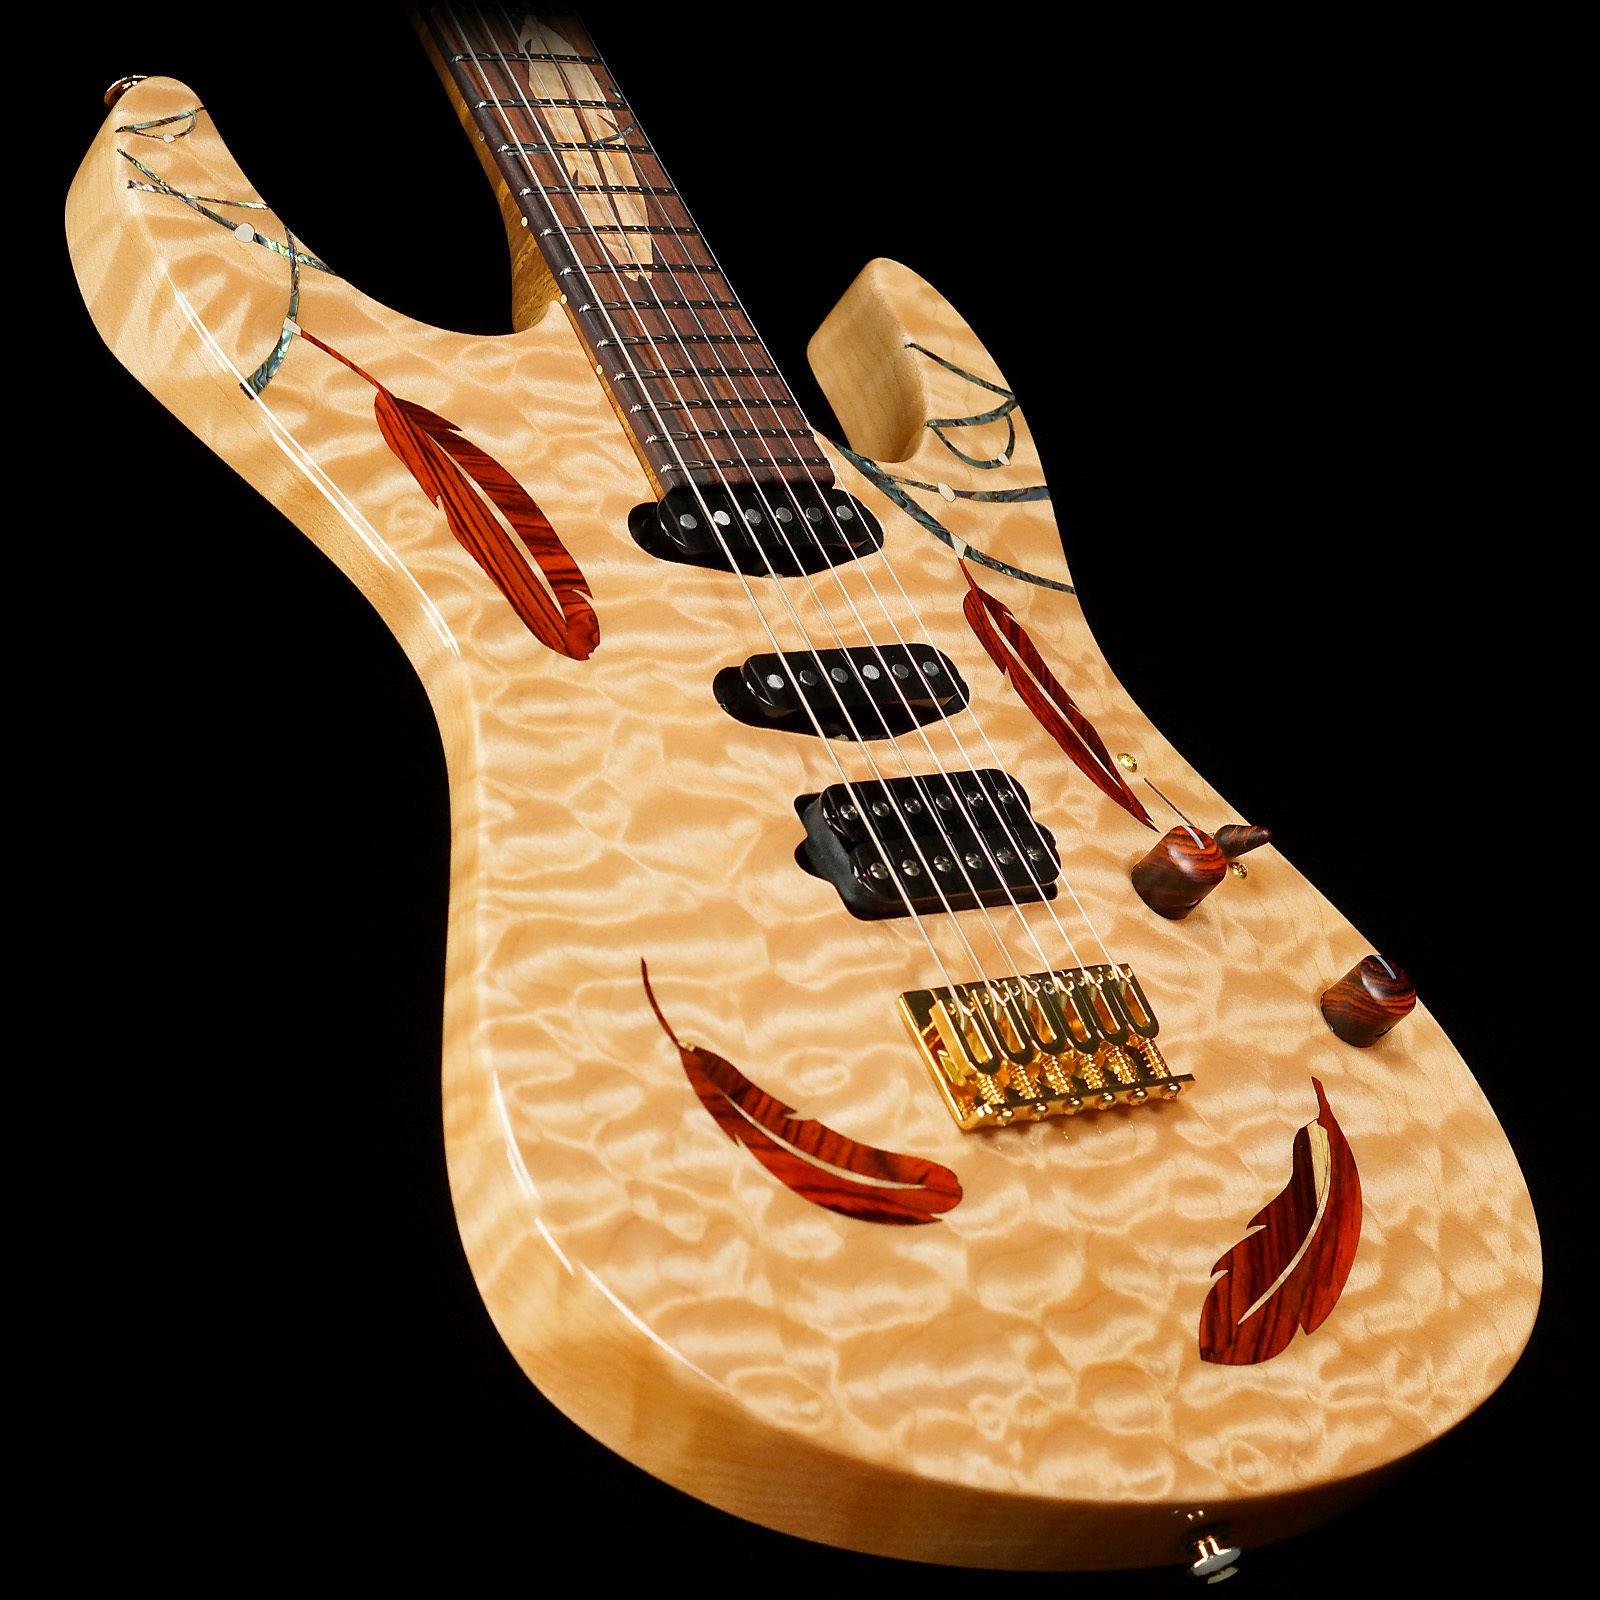 Suhr Guitars Modern Dreamcatcher Model.